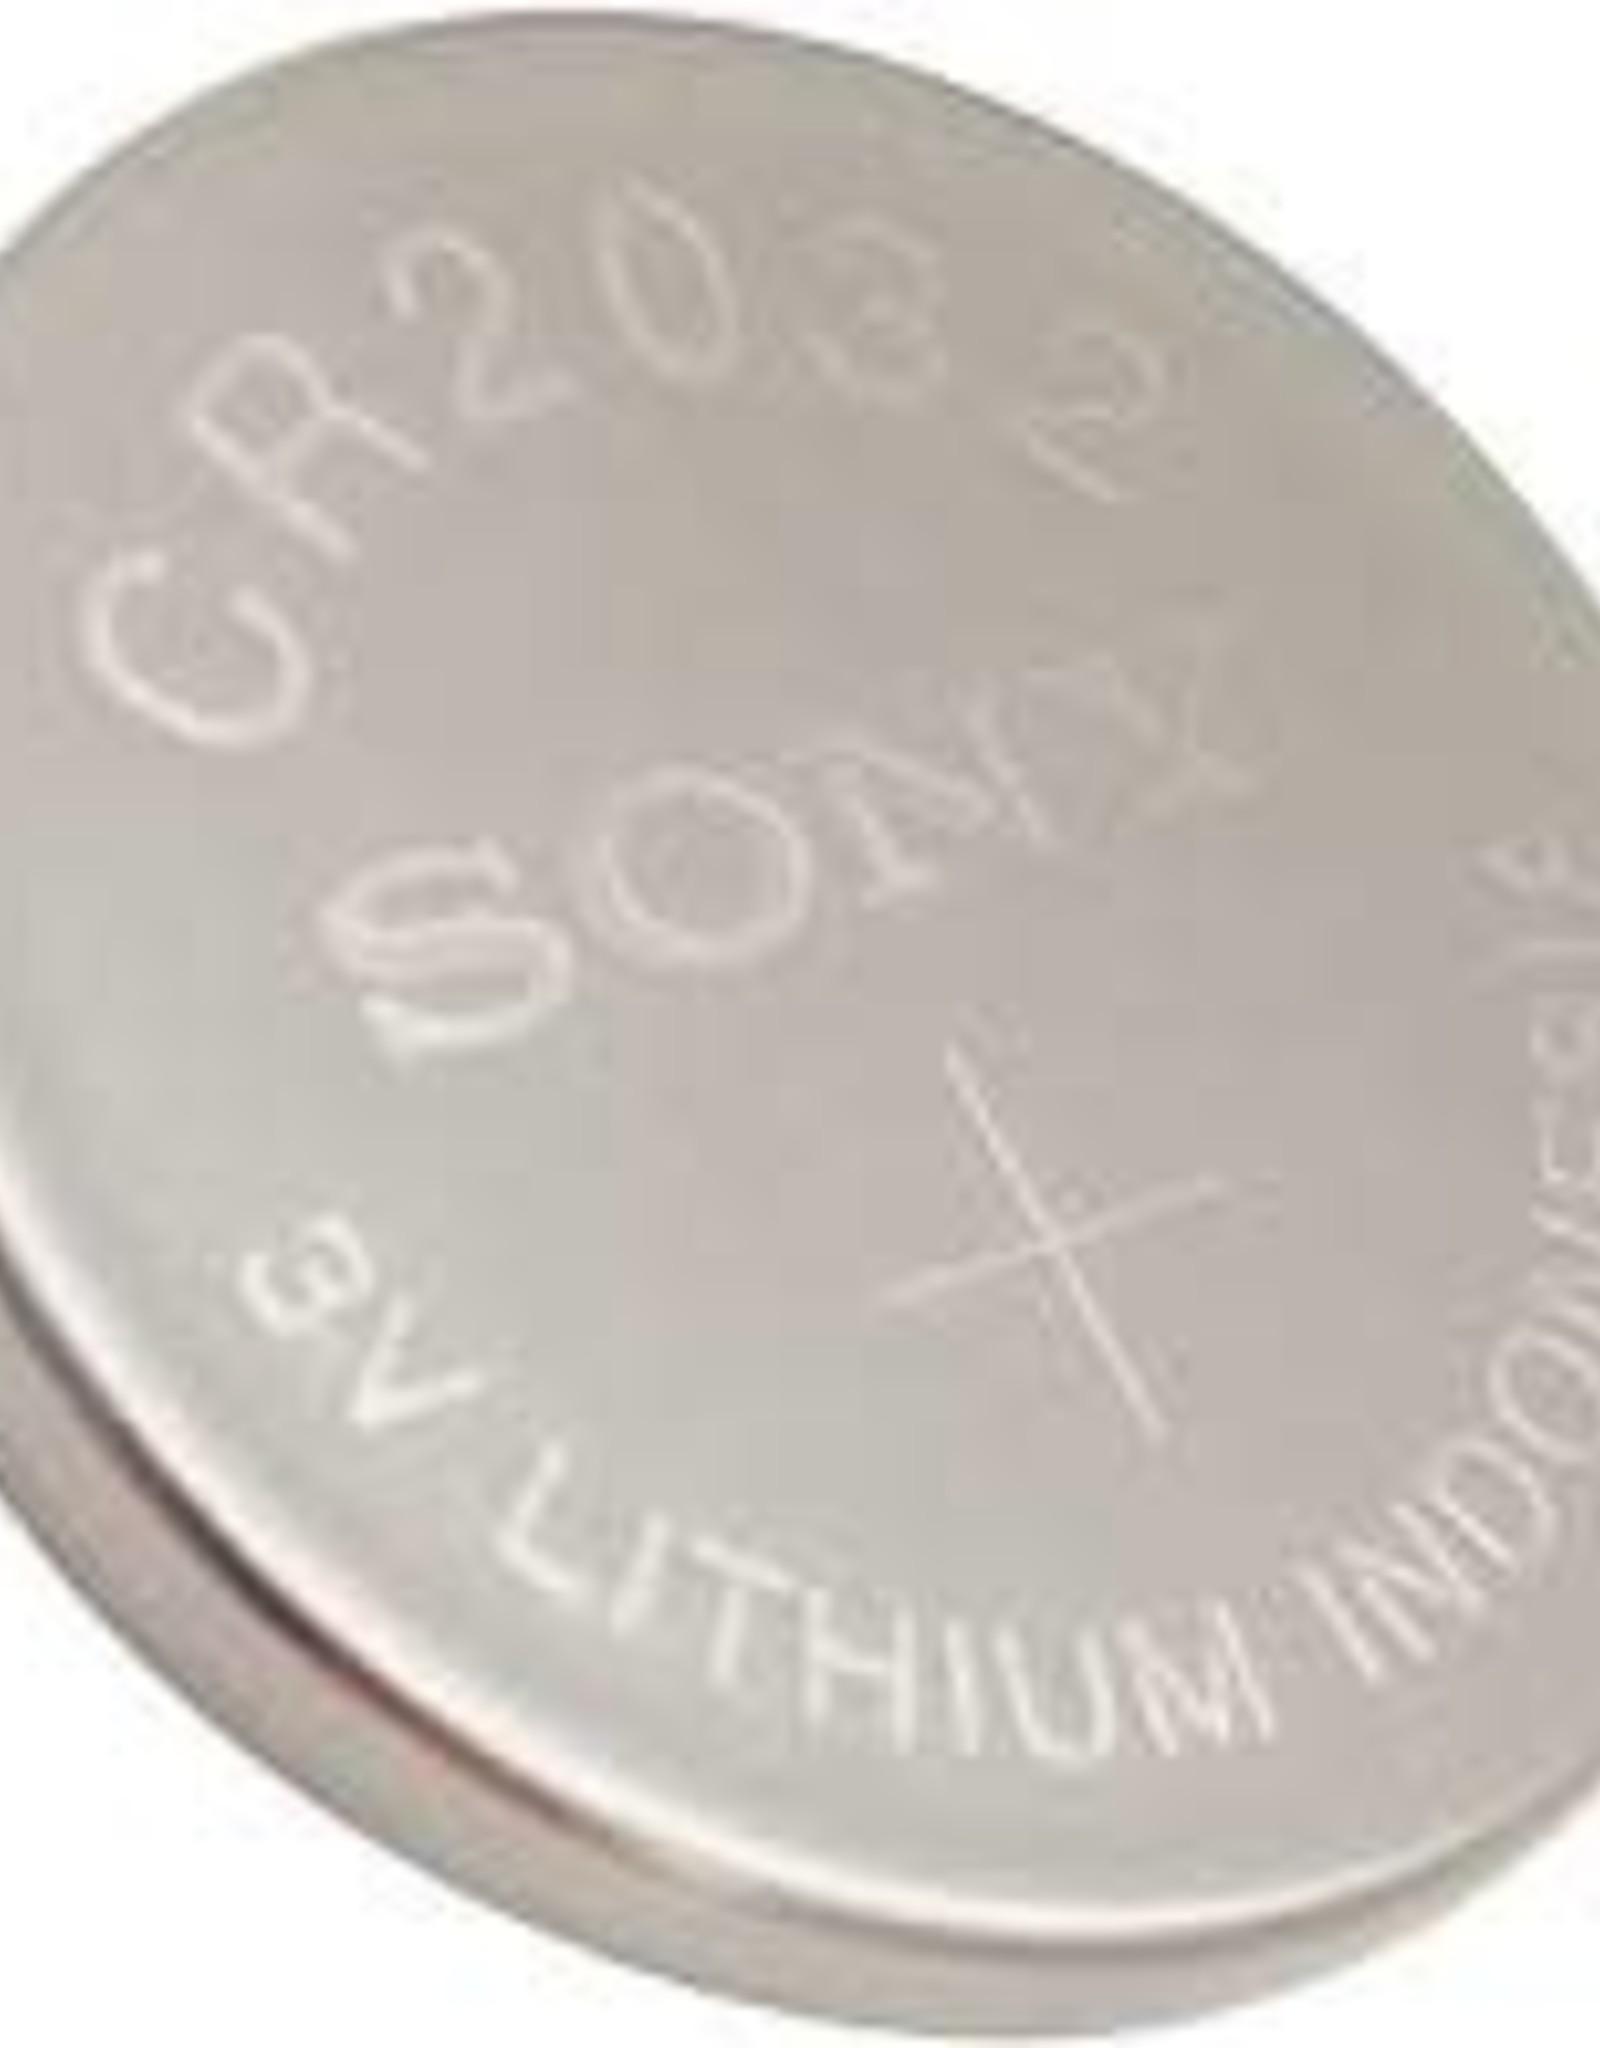 Energizer 2032 Lithium